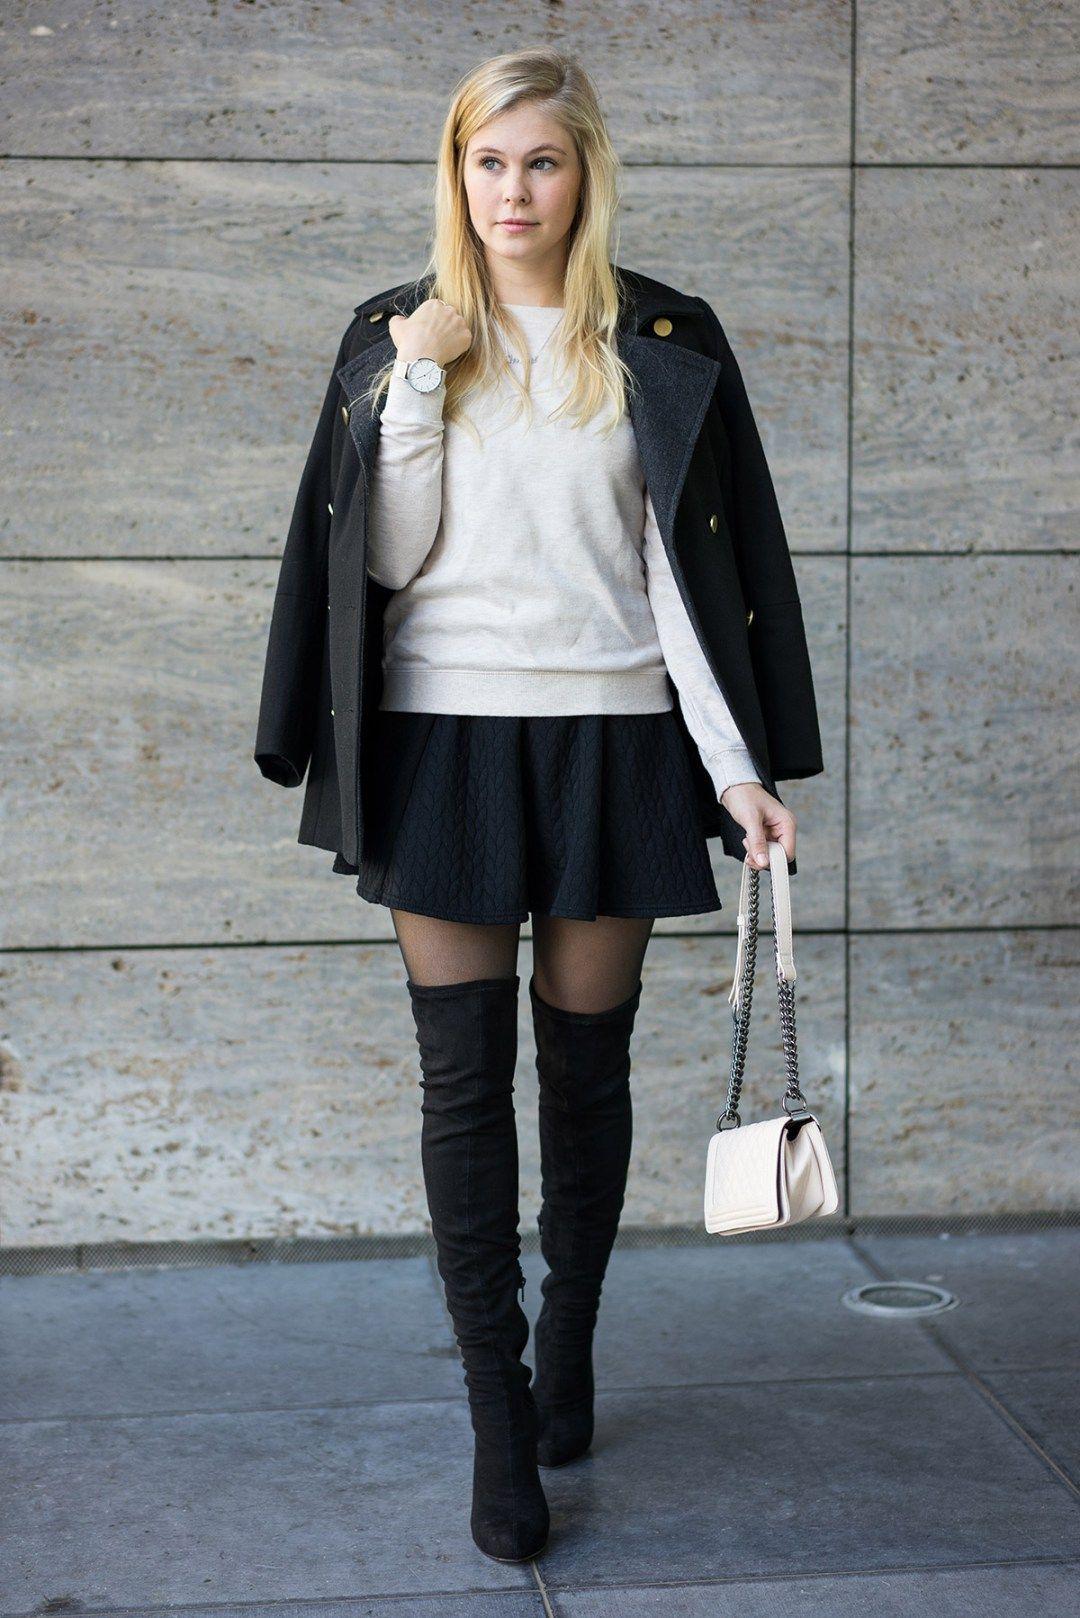 301e9fa8c76 Schwarze Overknees - Das perfekte Outfit by Sunnyinga - Fashion Blog ...